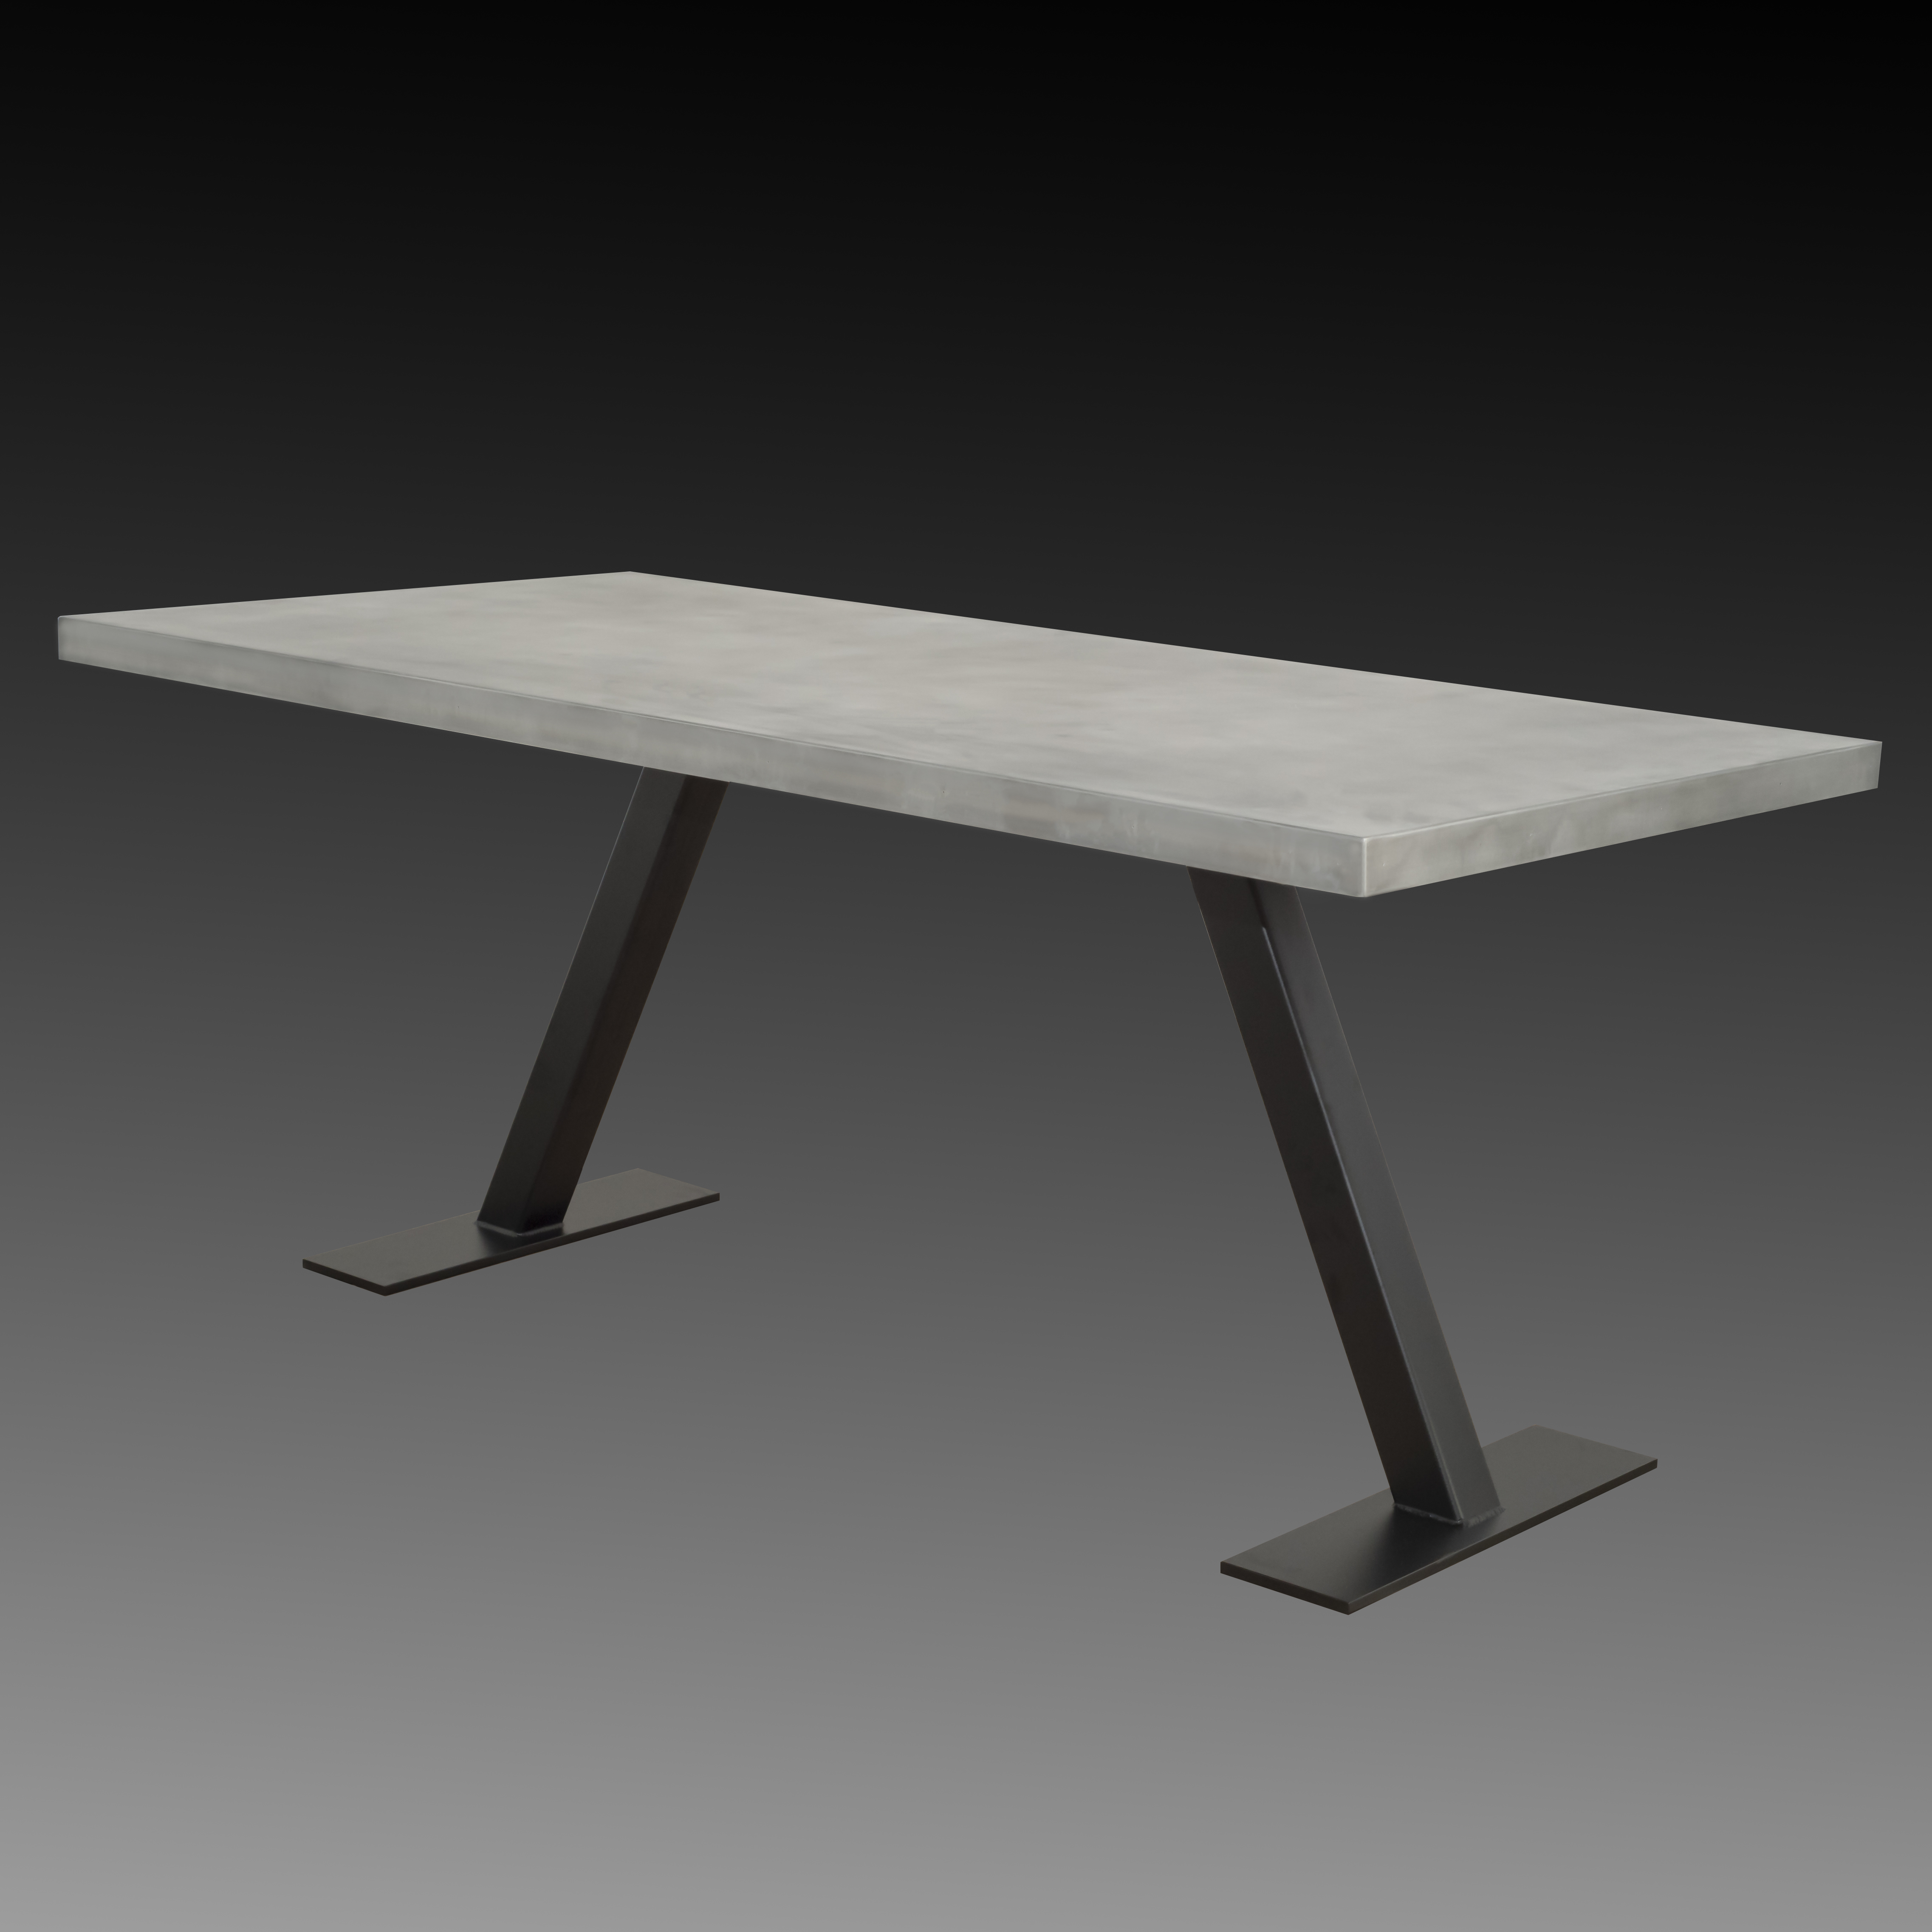 Zinc Table with Elena Base Custom Metal Home : Elena 2579B from custommetalhome.com size 4548 x 4548 jpeg 1913kB